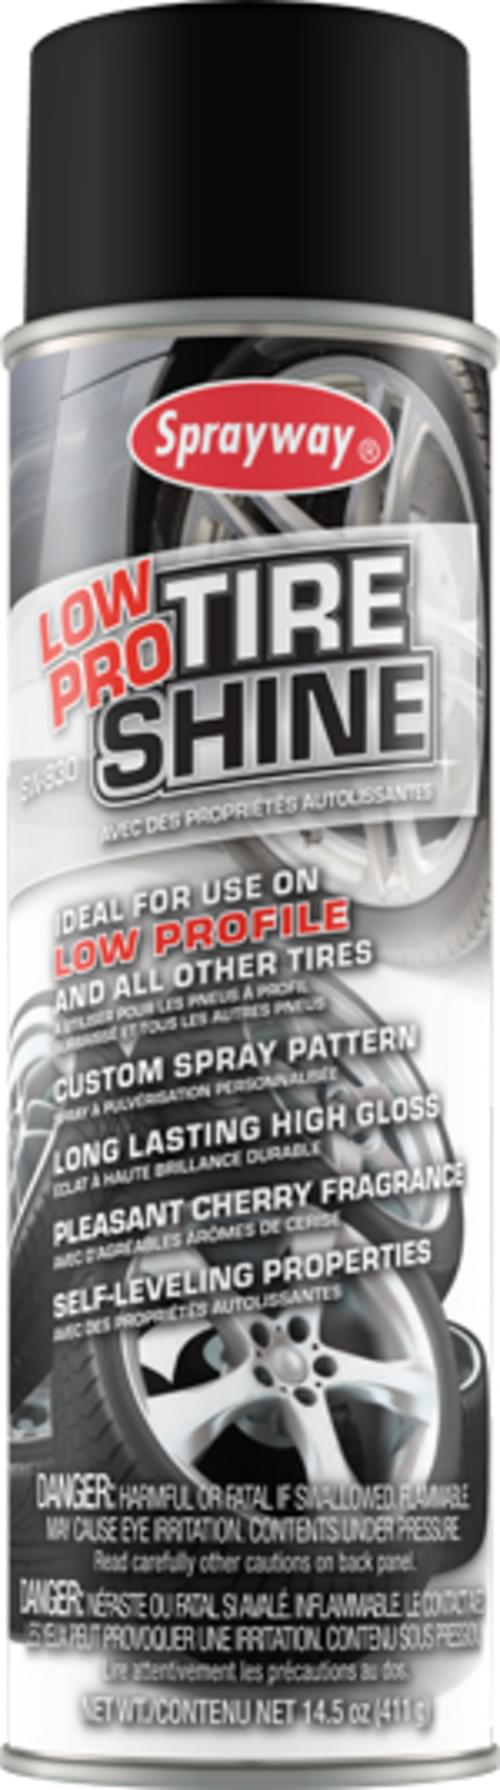 20 oz. Low Pro Tire Shine